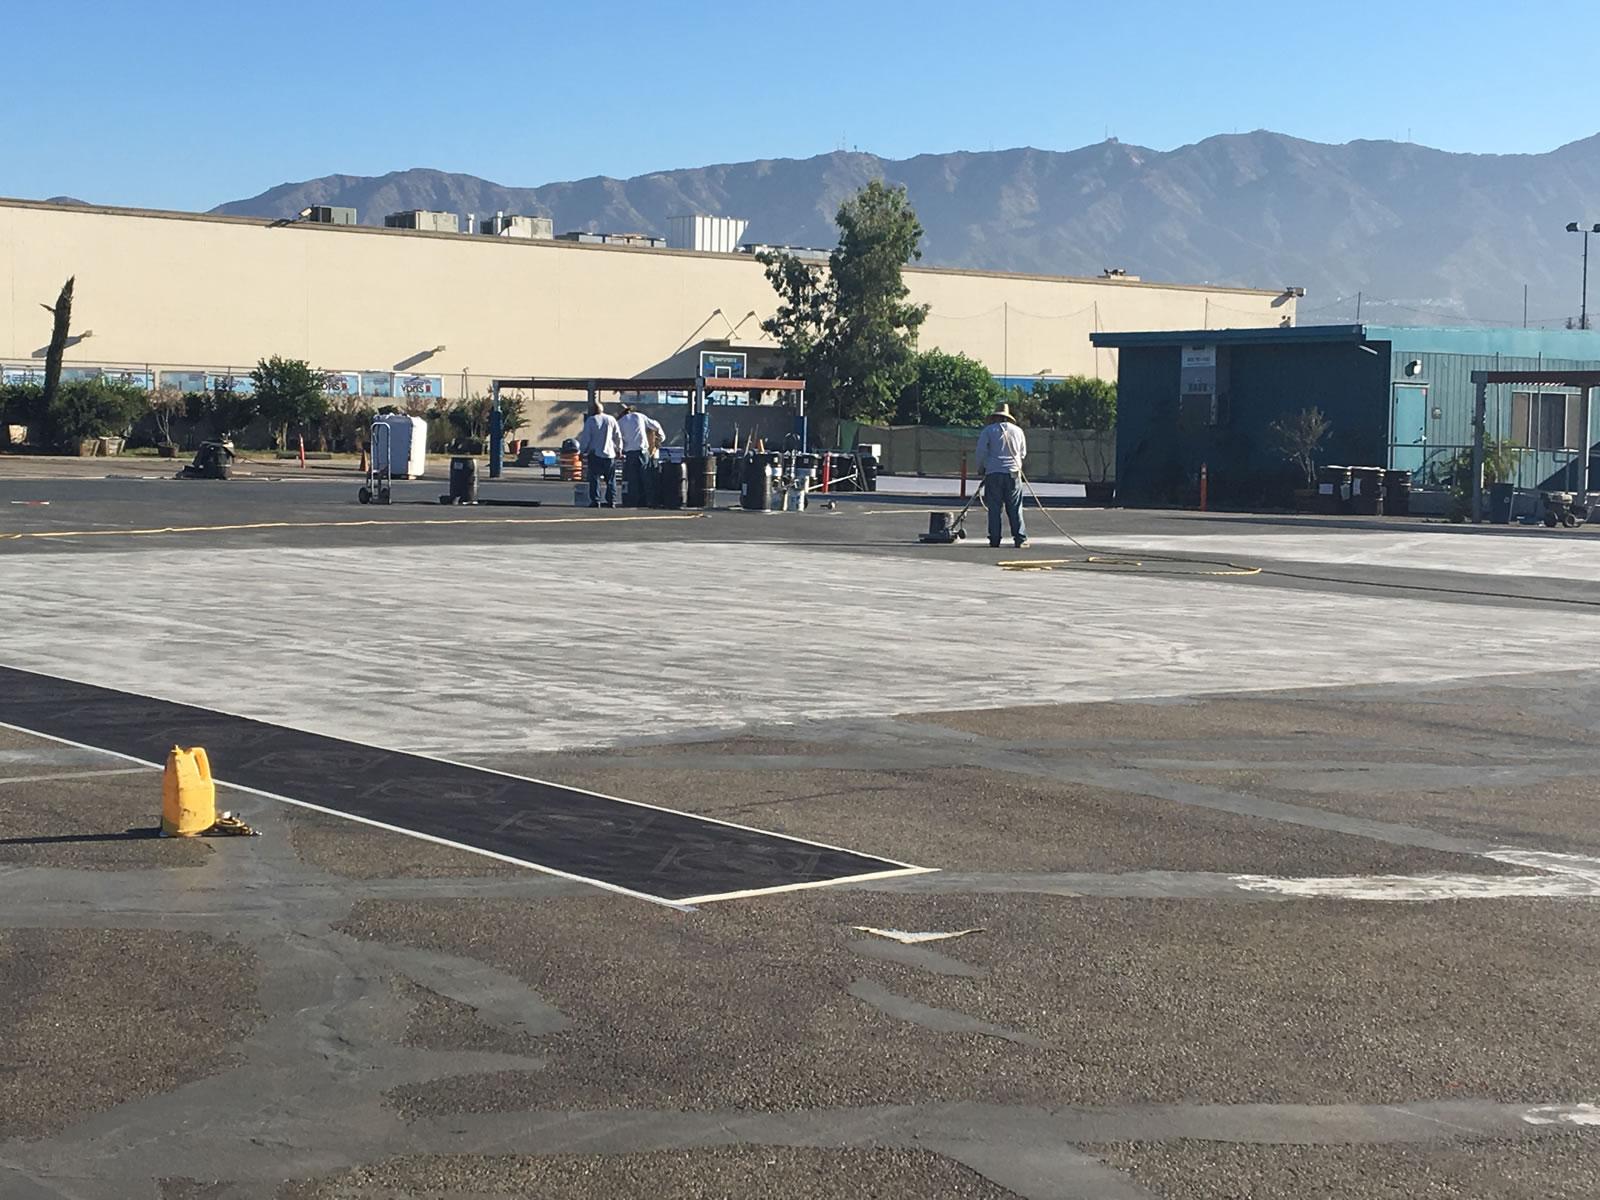 Innovations sportives sur le campus de burbank for Los angeles innovation consultants